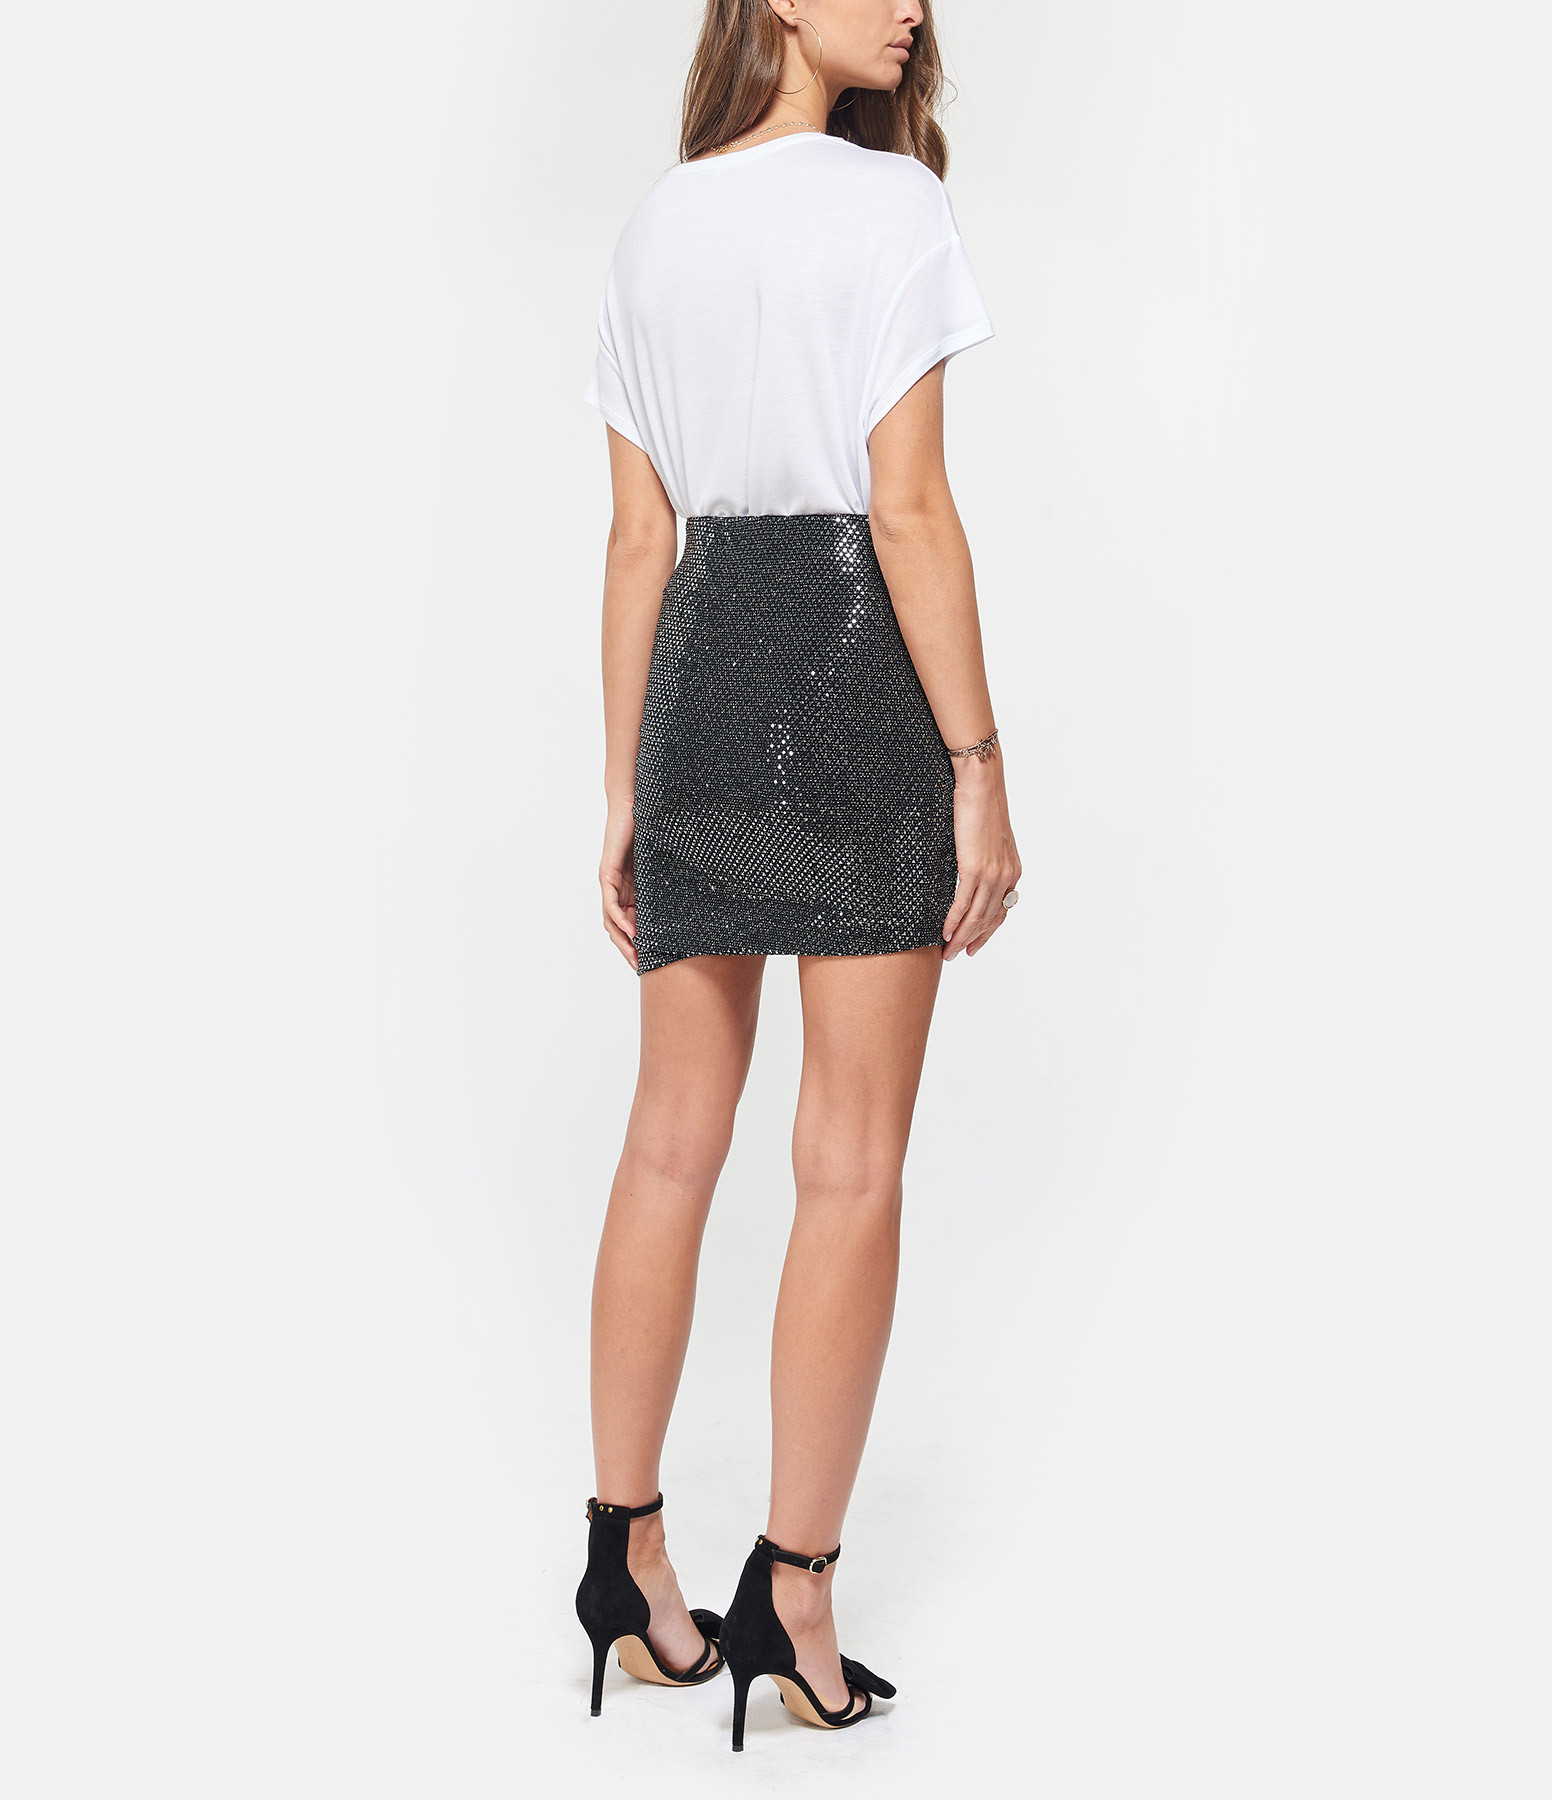 JEANNE VOULAND - Tee-shirt Bacha Lyocell Blanc